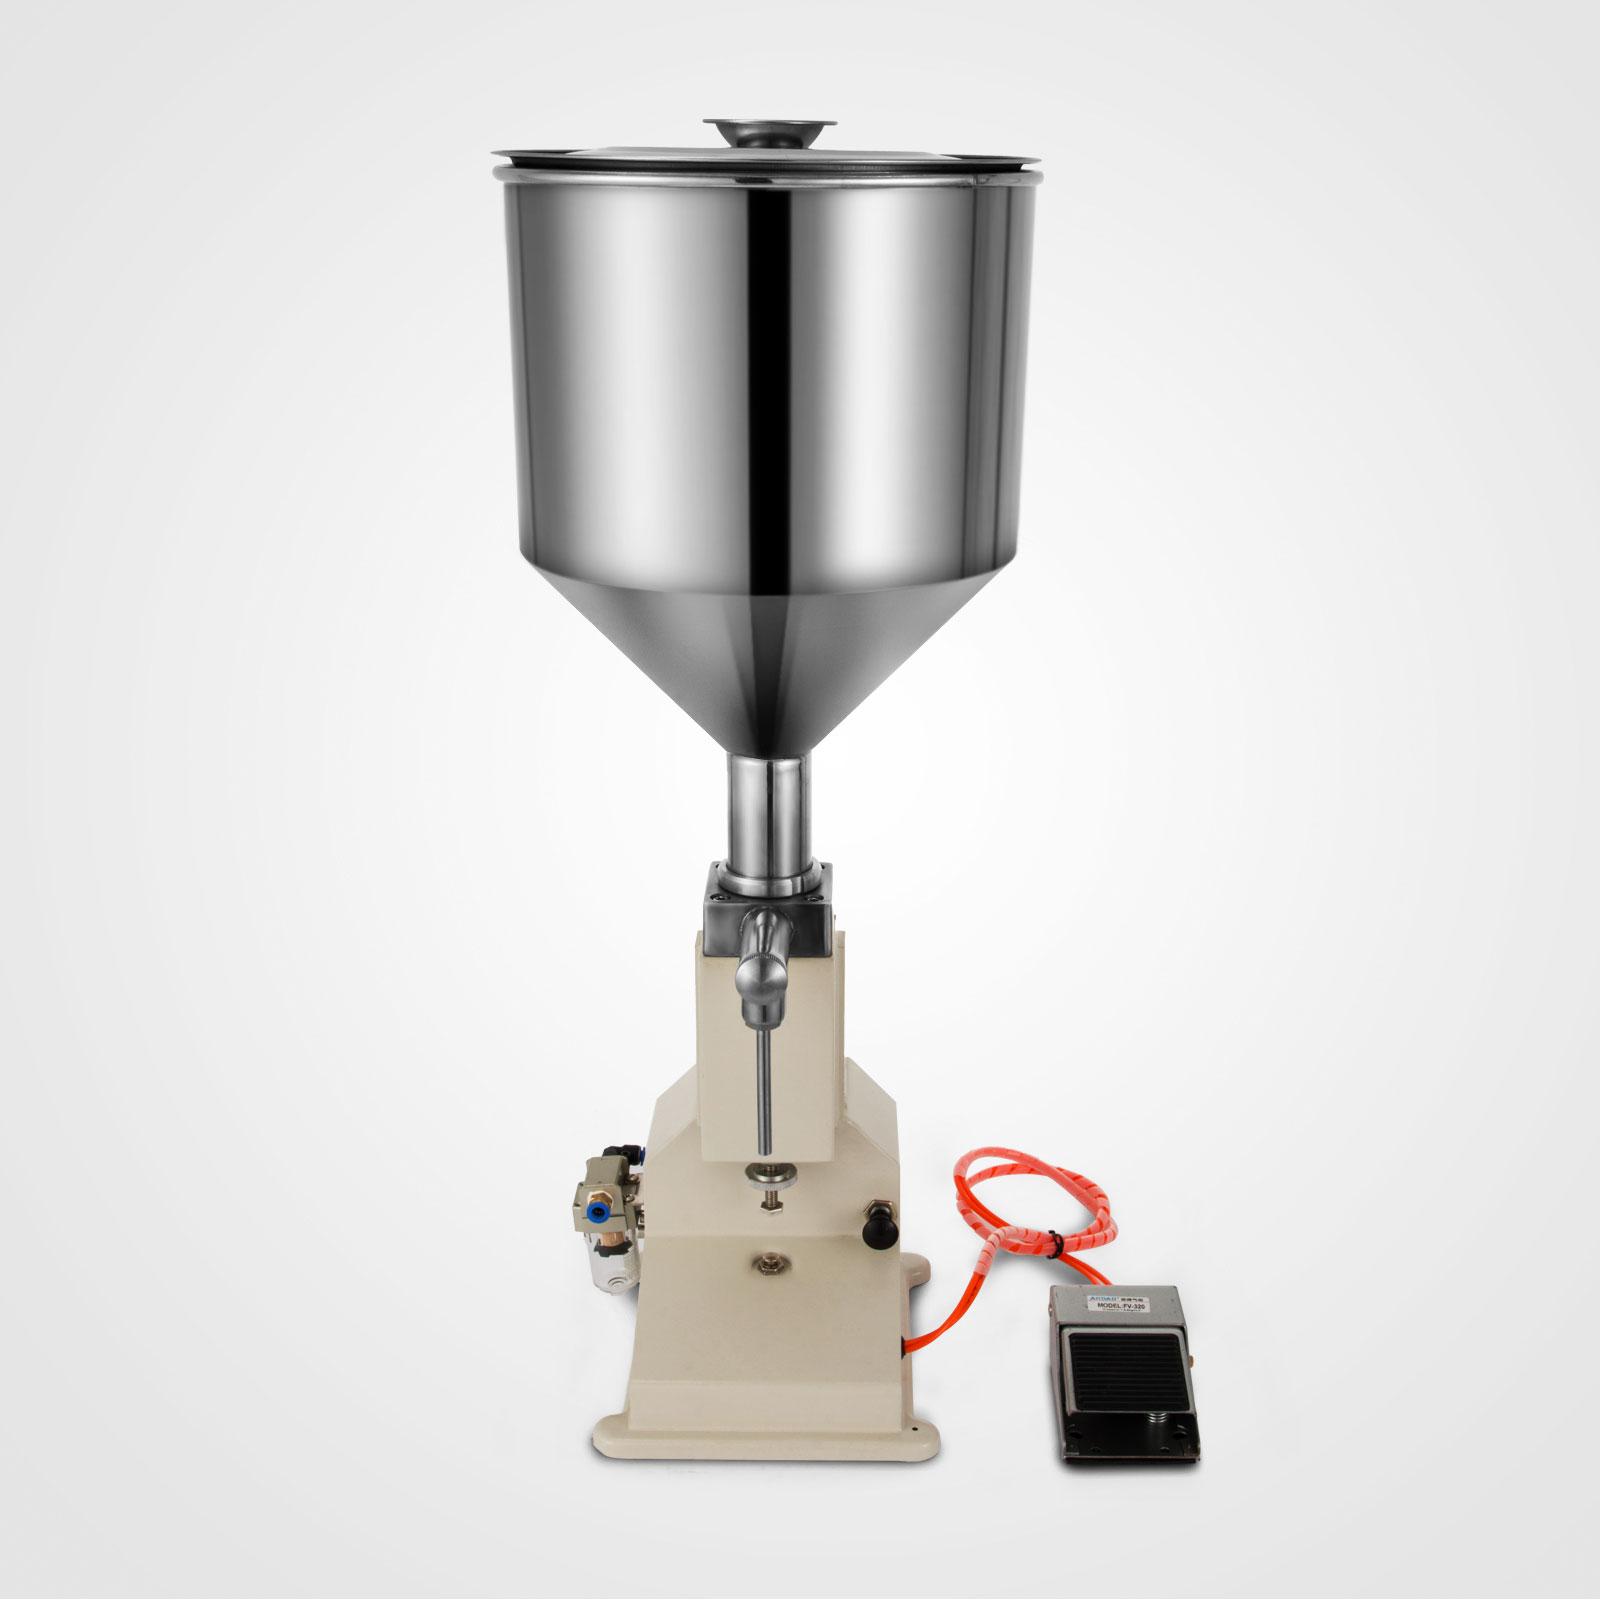 Liquid-Filling-Machine-Filler-Remplissage-2-3500ML-50-500ML-INDUSTRY-SUPPLY miniature 53